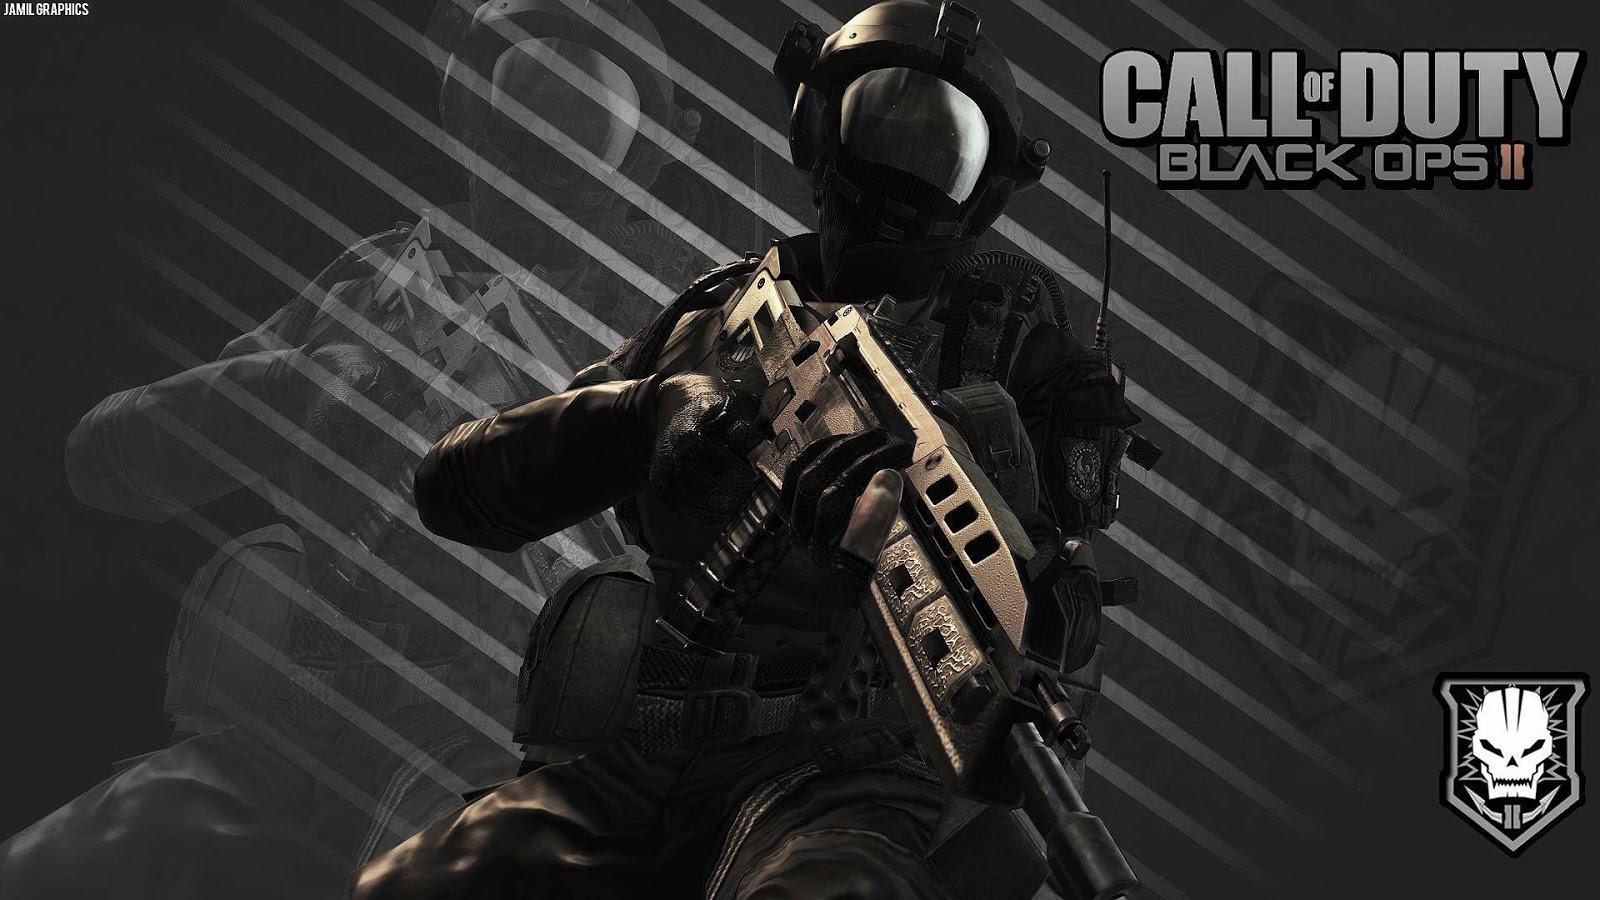 Call Of Duty Bo2 Wallpaper: Black Ops Wallpaper For Ipod